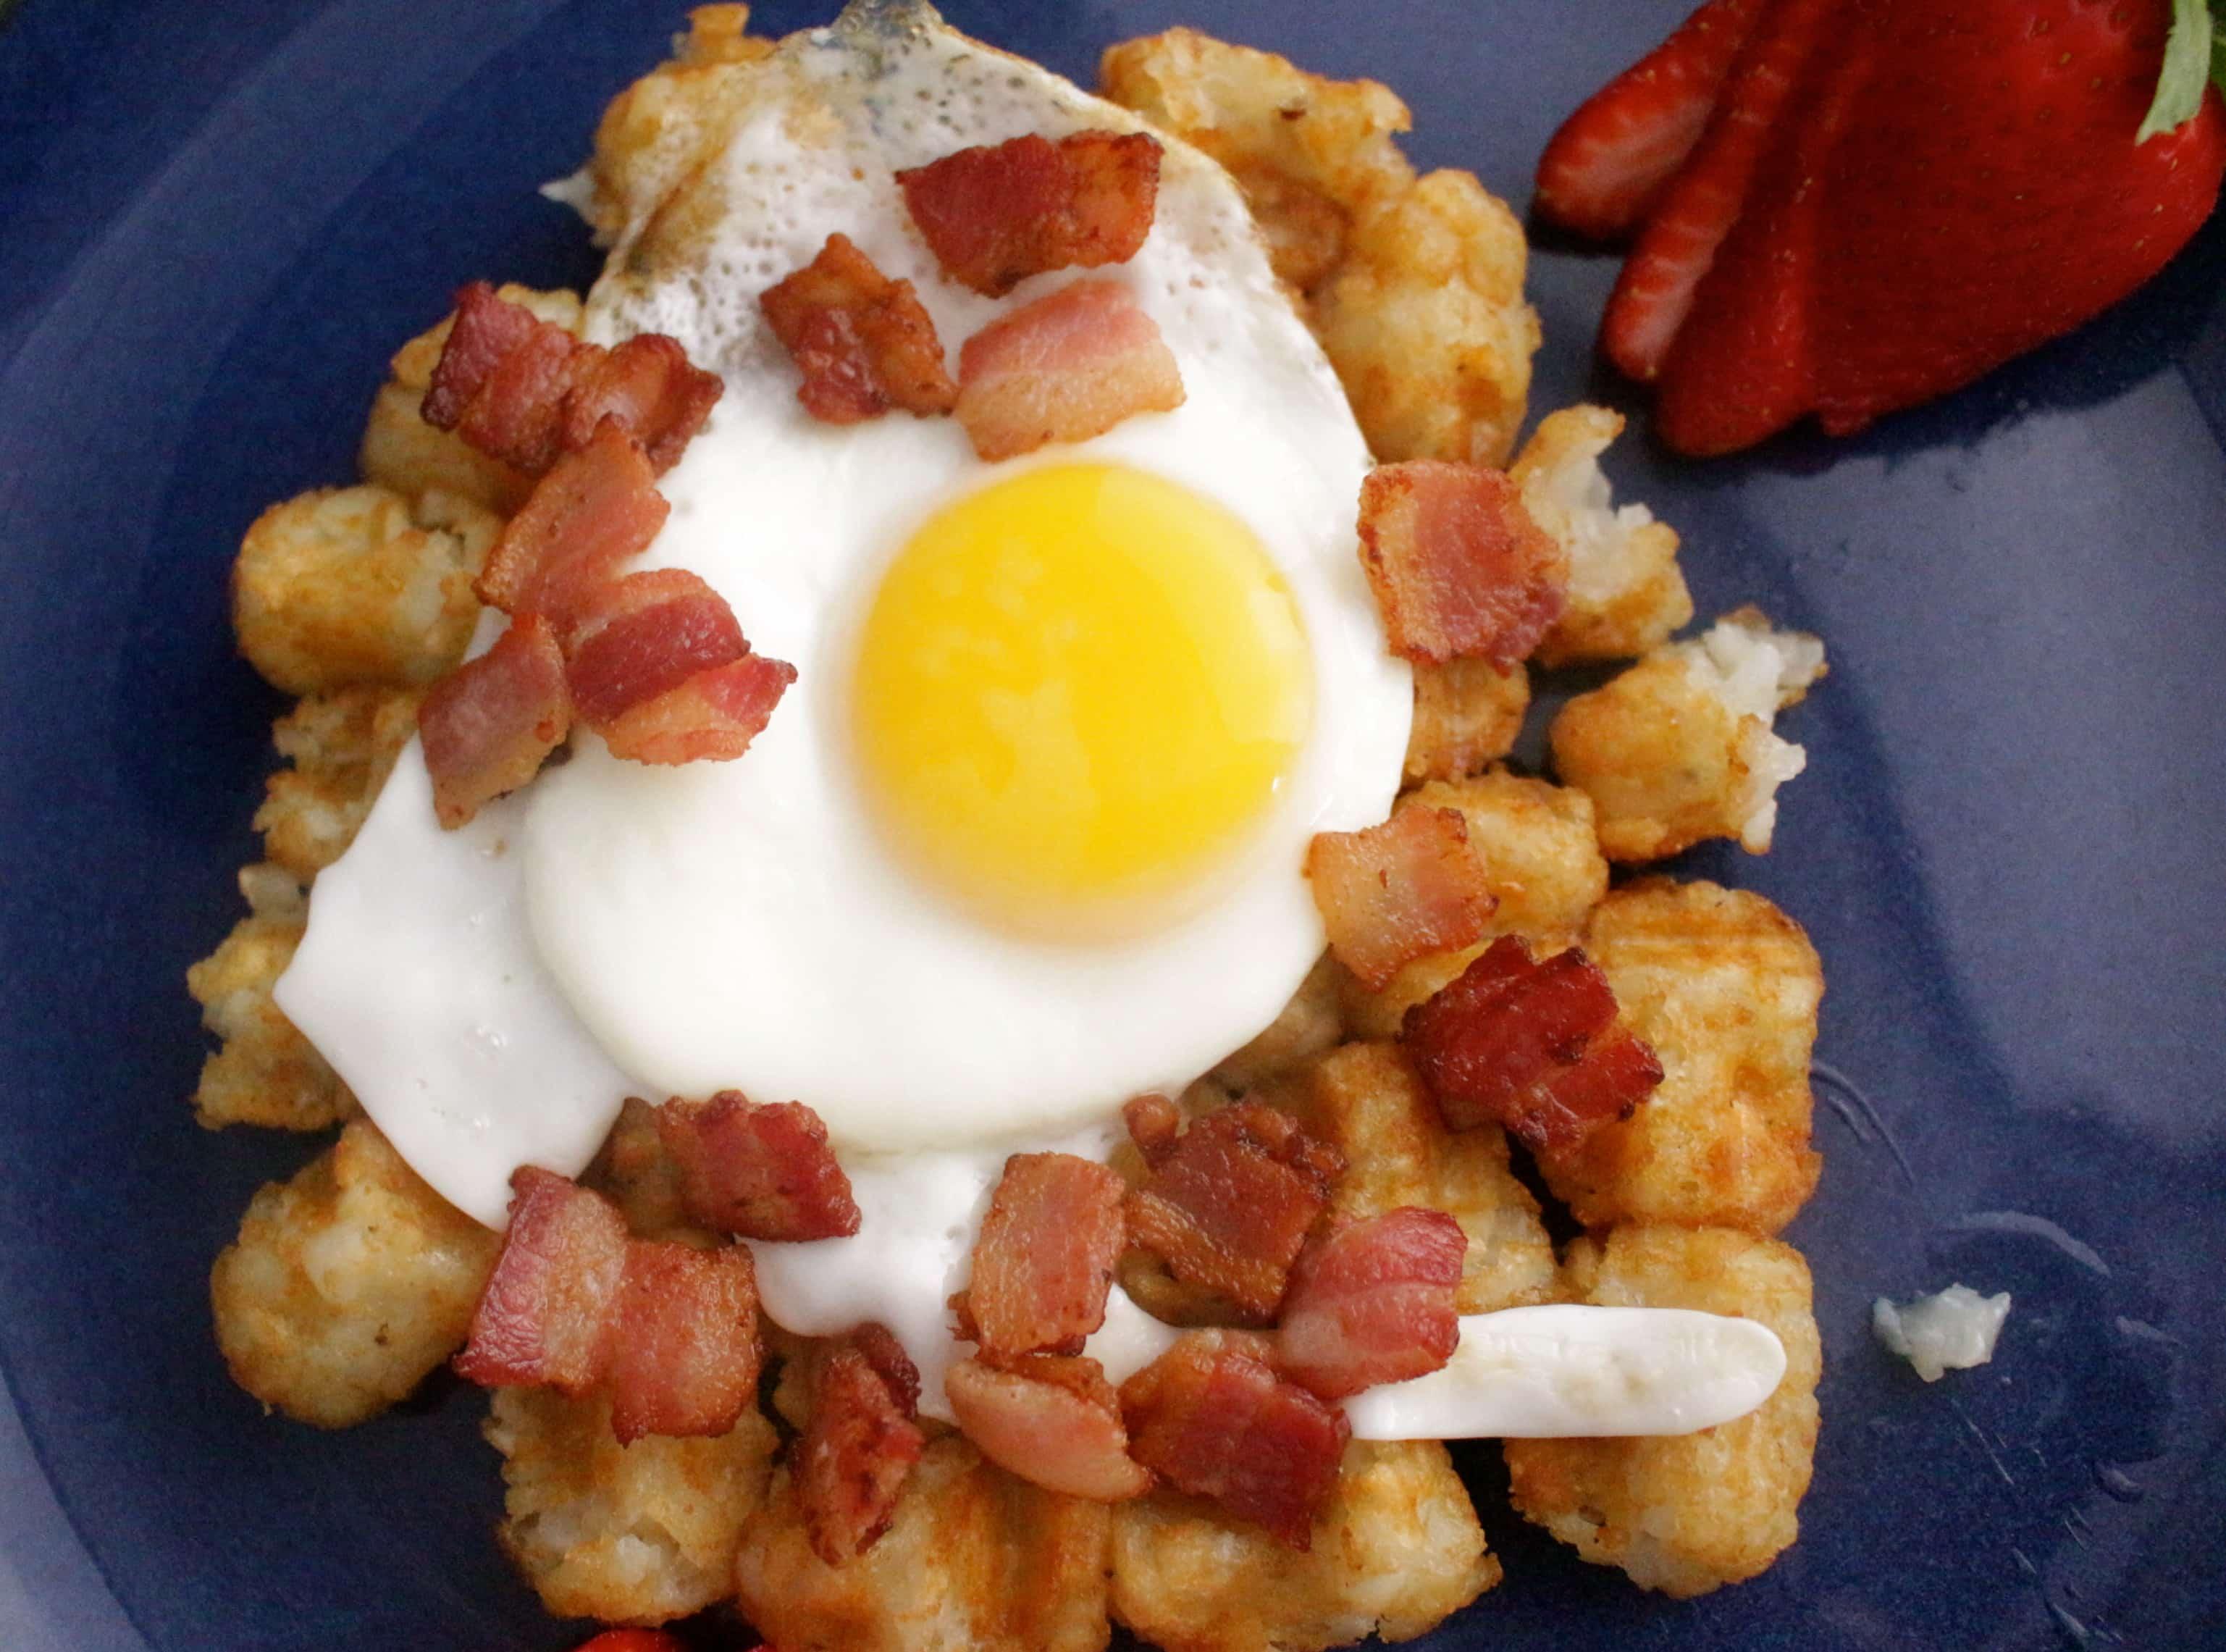 Tater Tot Waffle Breakfast